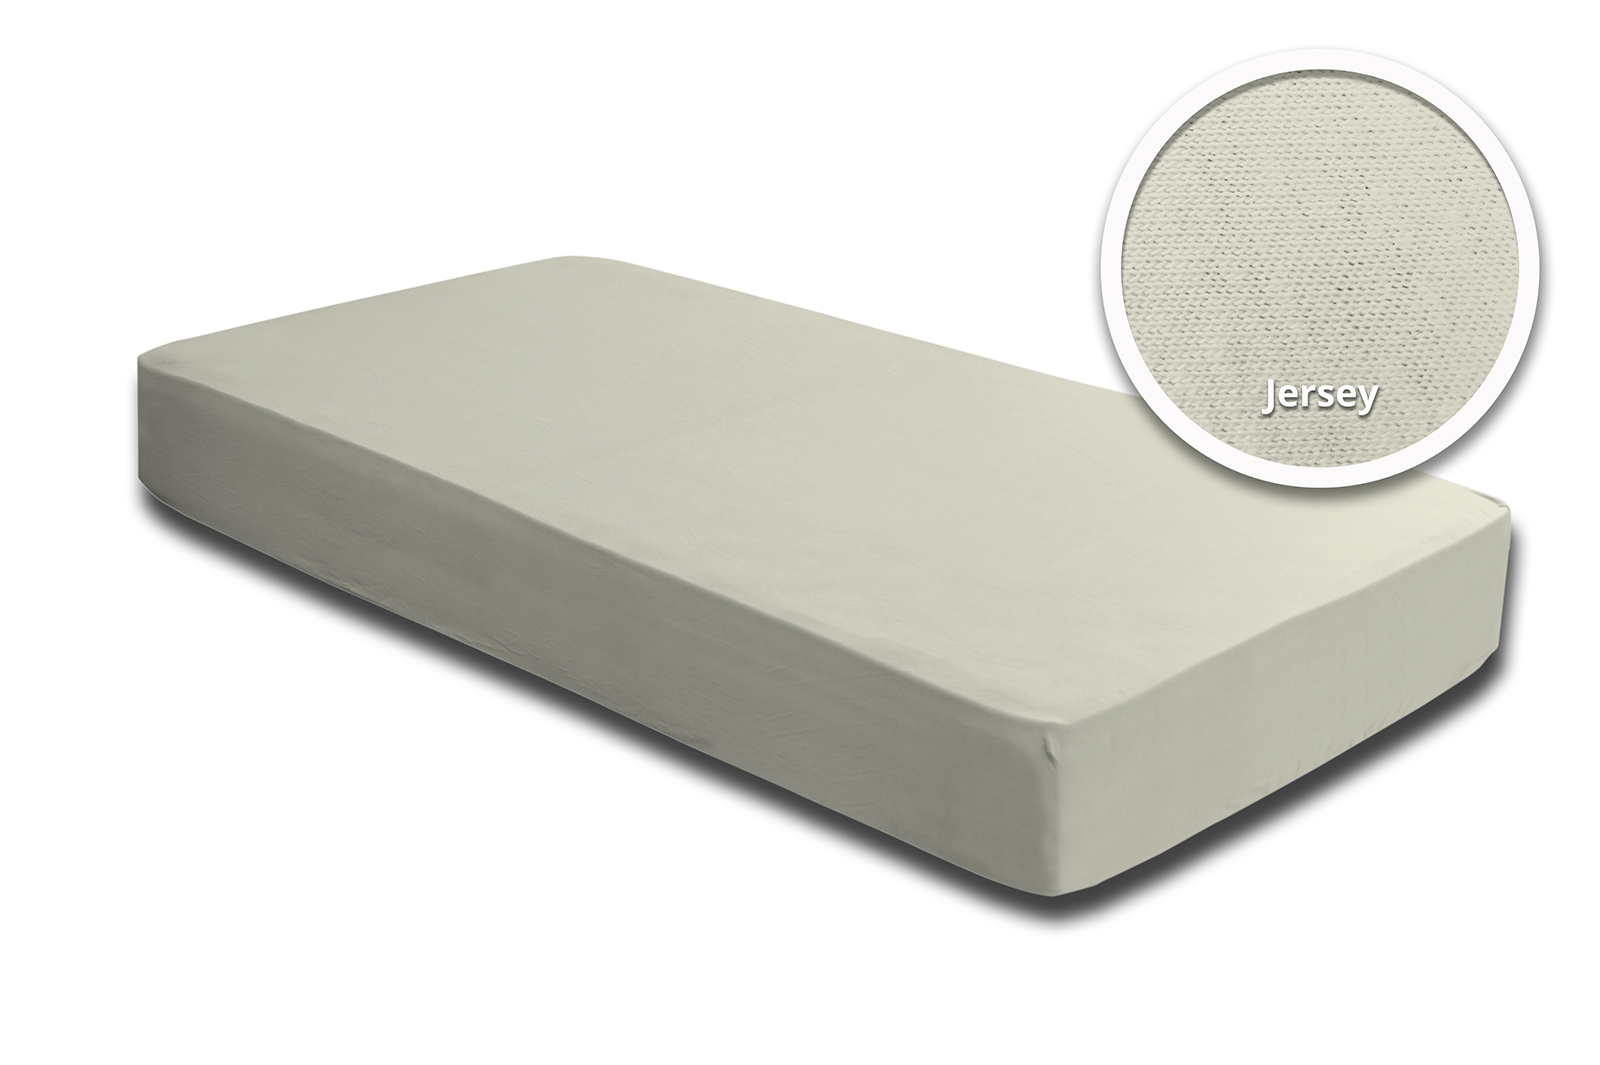 topper spannbettlaken bettlaken creme natur 180x200 cm. Black Bedroom Furniture Sets. Home Design Ideas